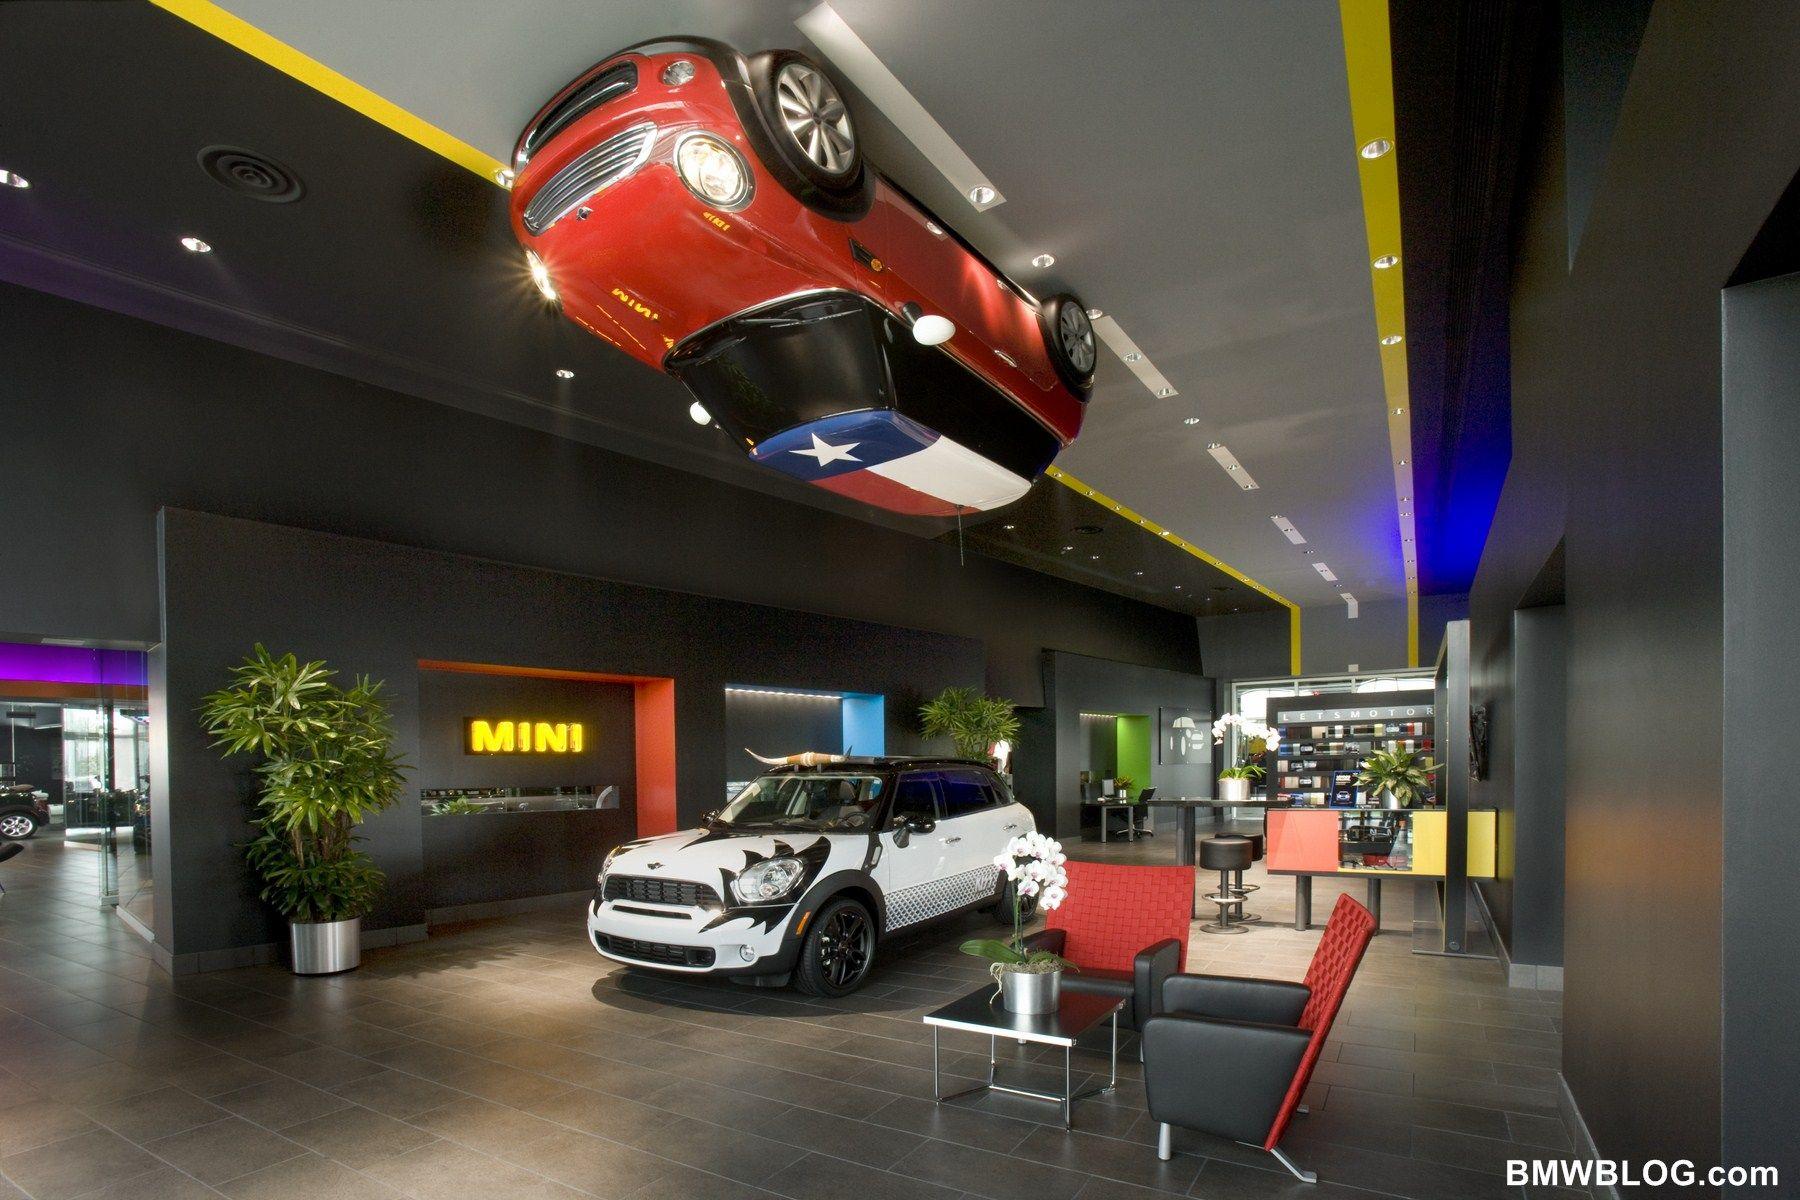 Dedicated mini dealership features dramatic design and fun